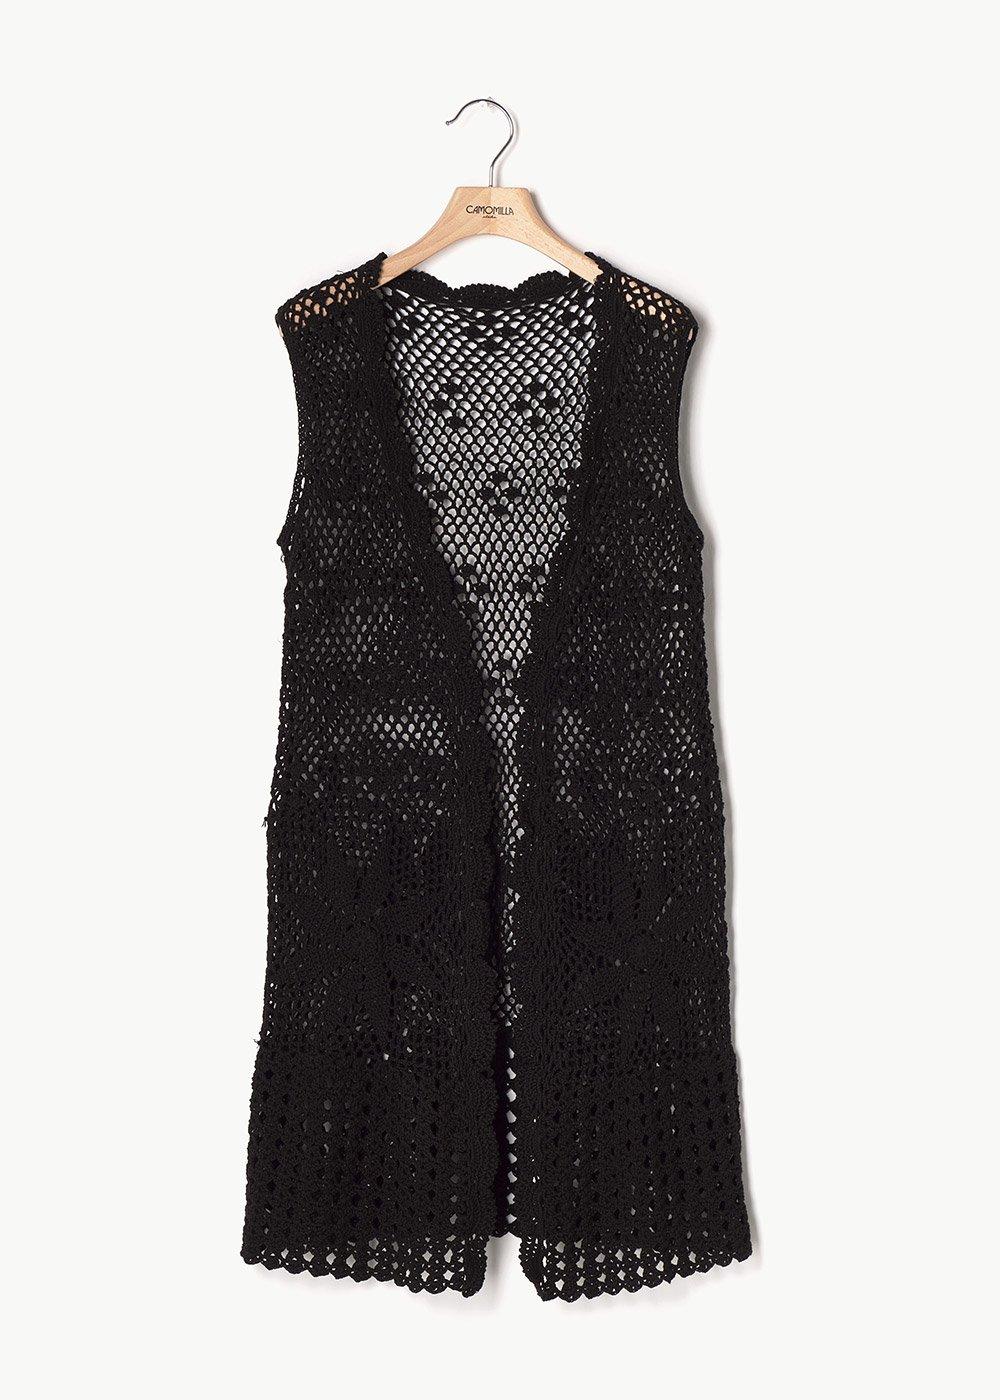 Claudio embroidered waistcoat - Black - Woman